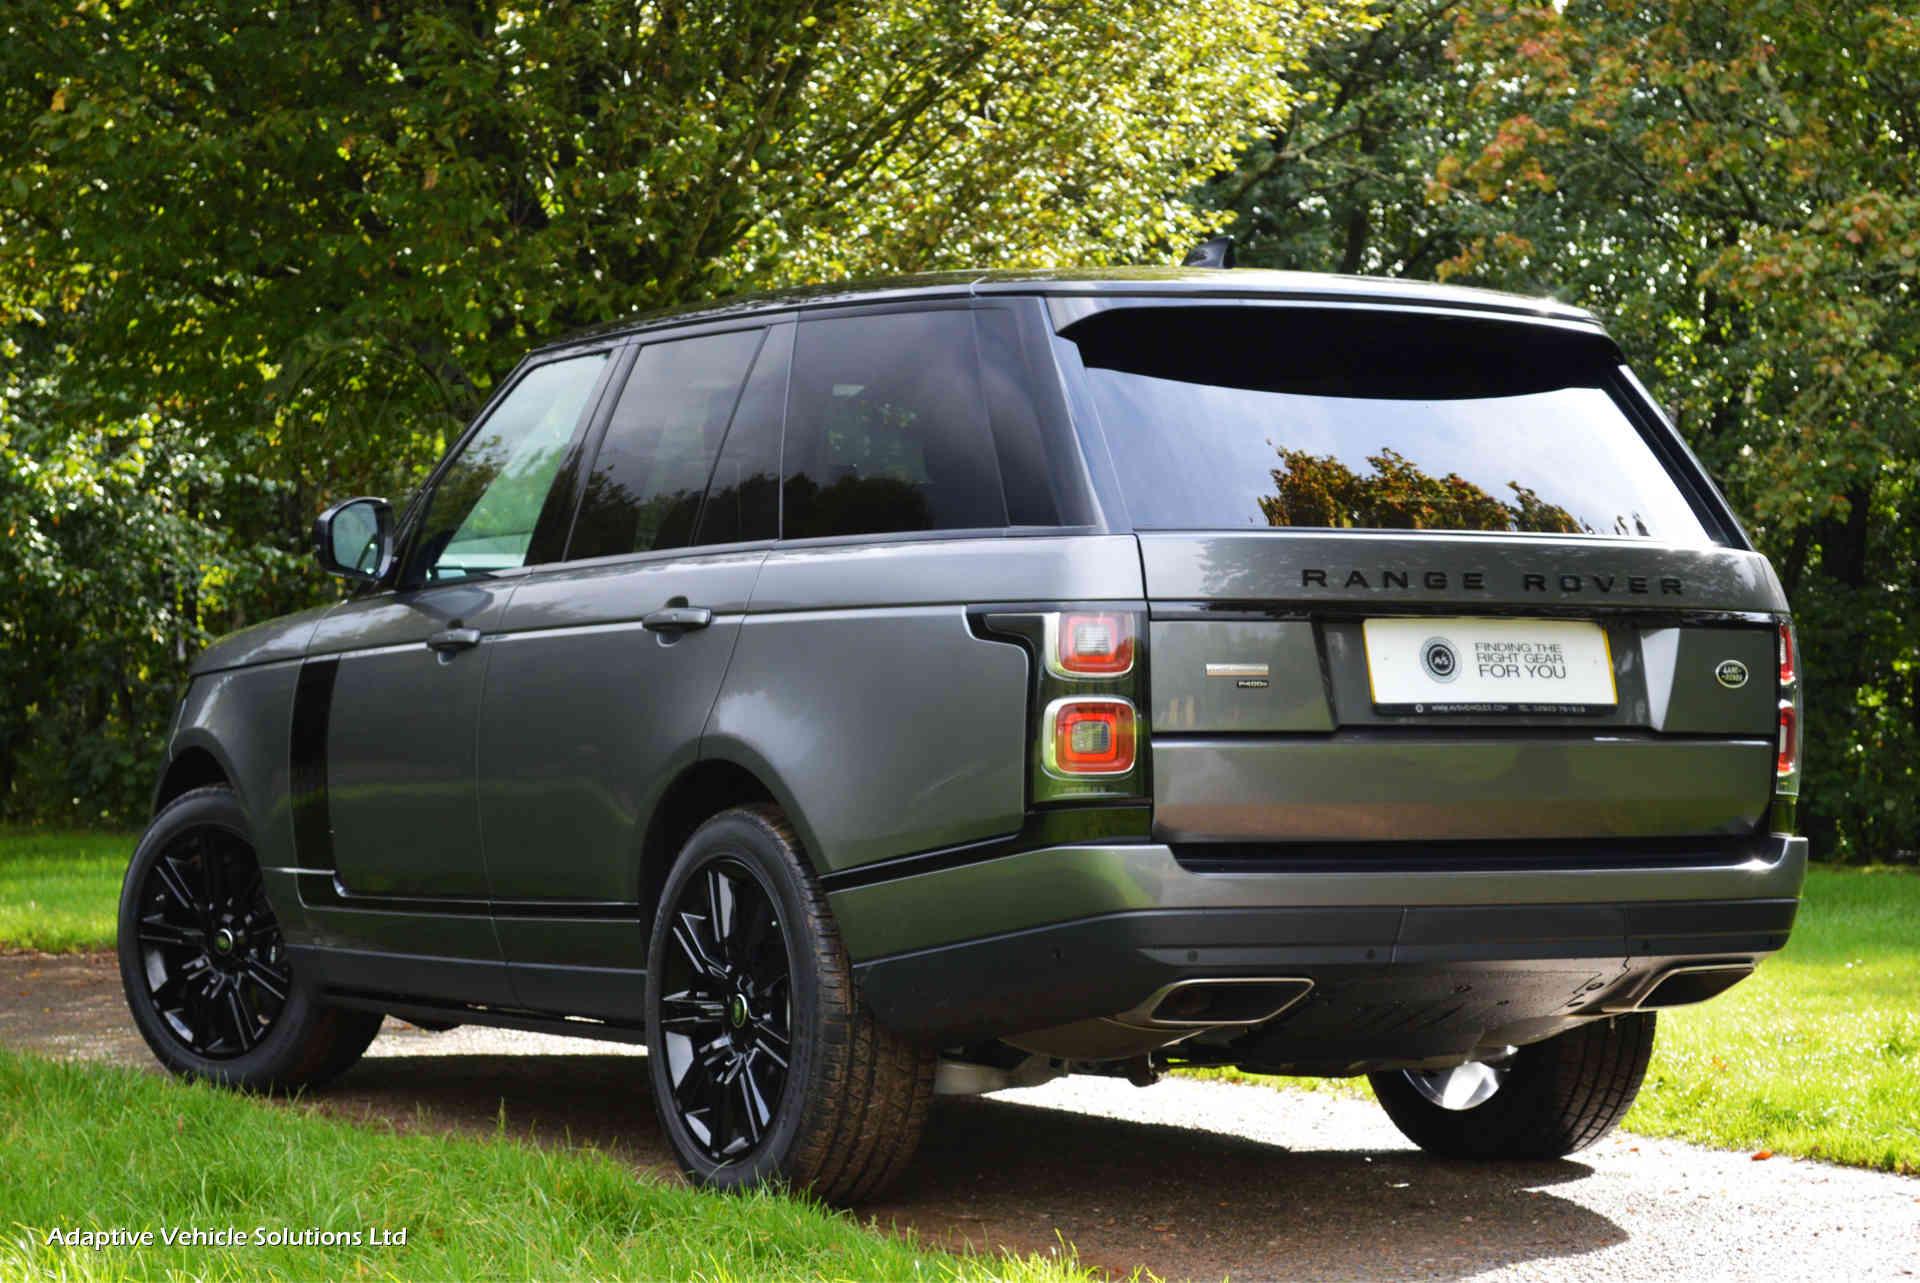 2019 Range Rover Autobiography Hybrid PHEV 04